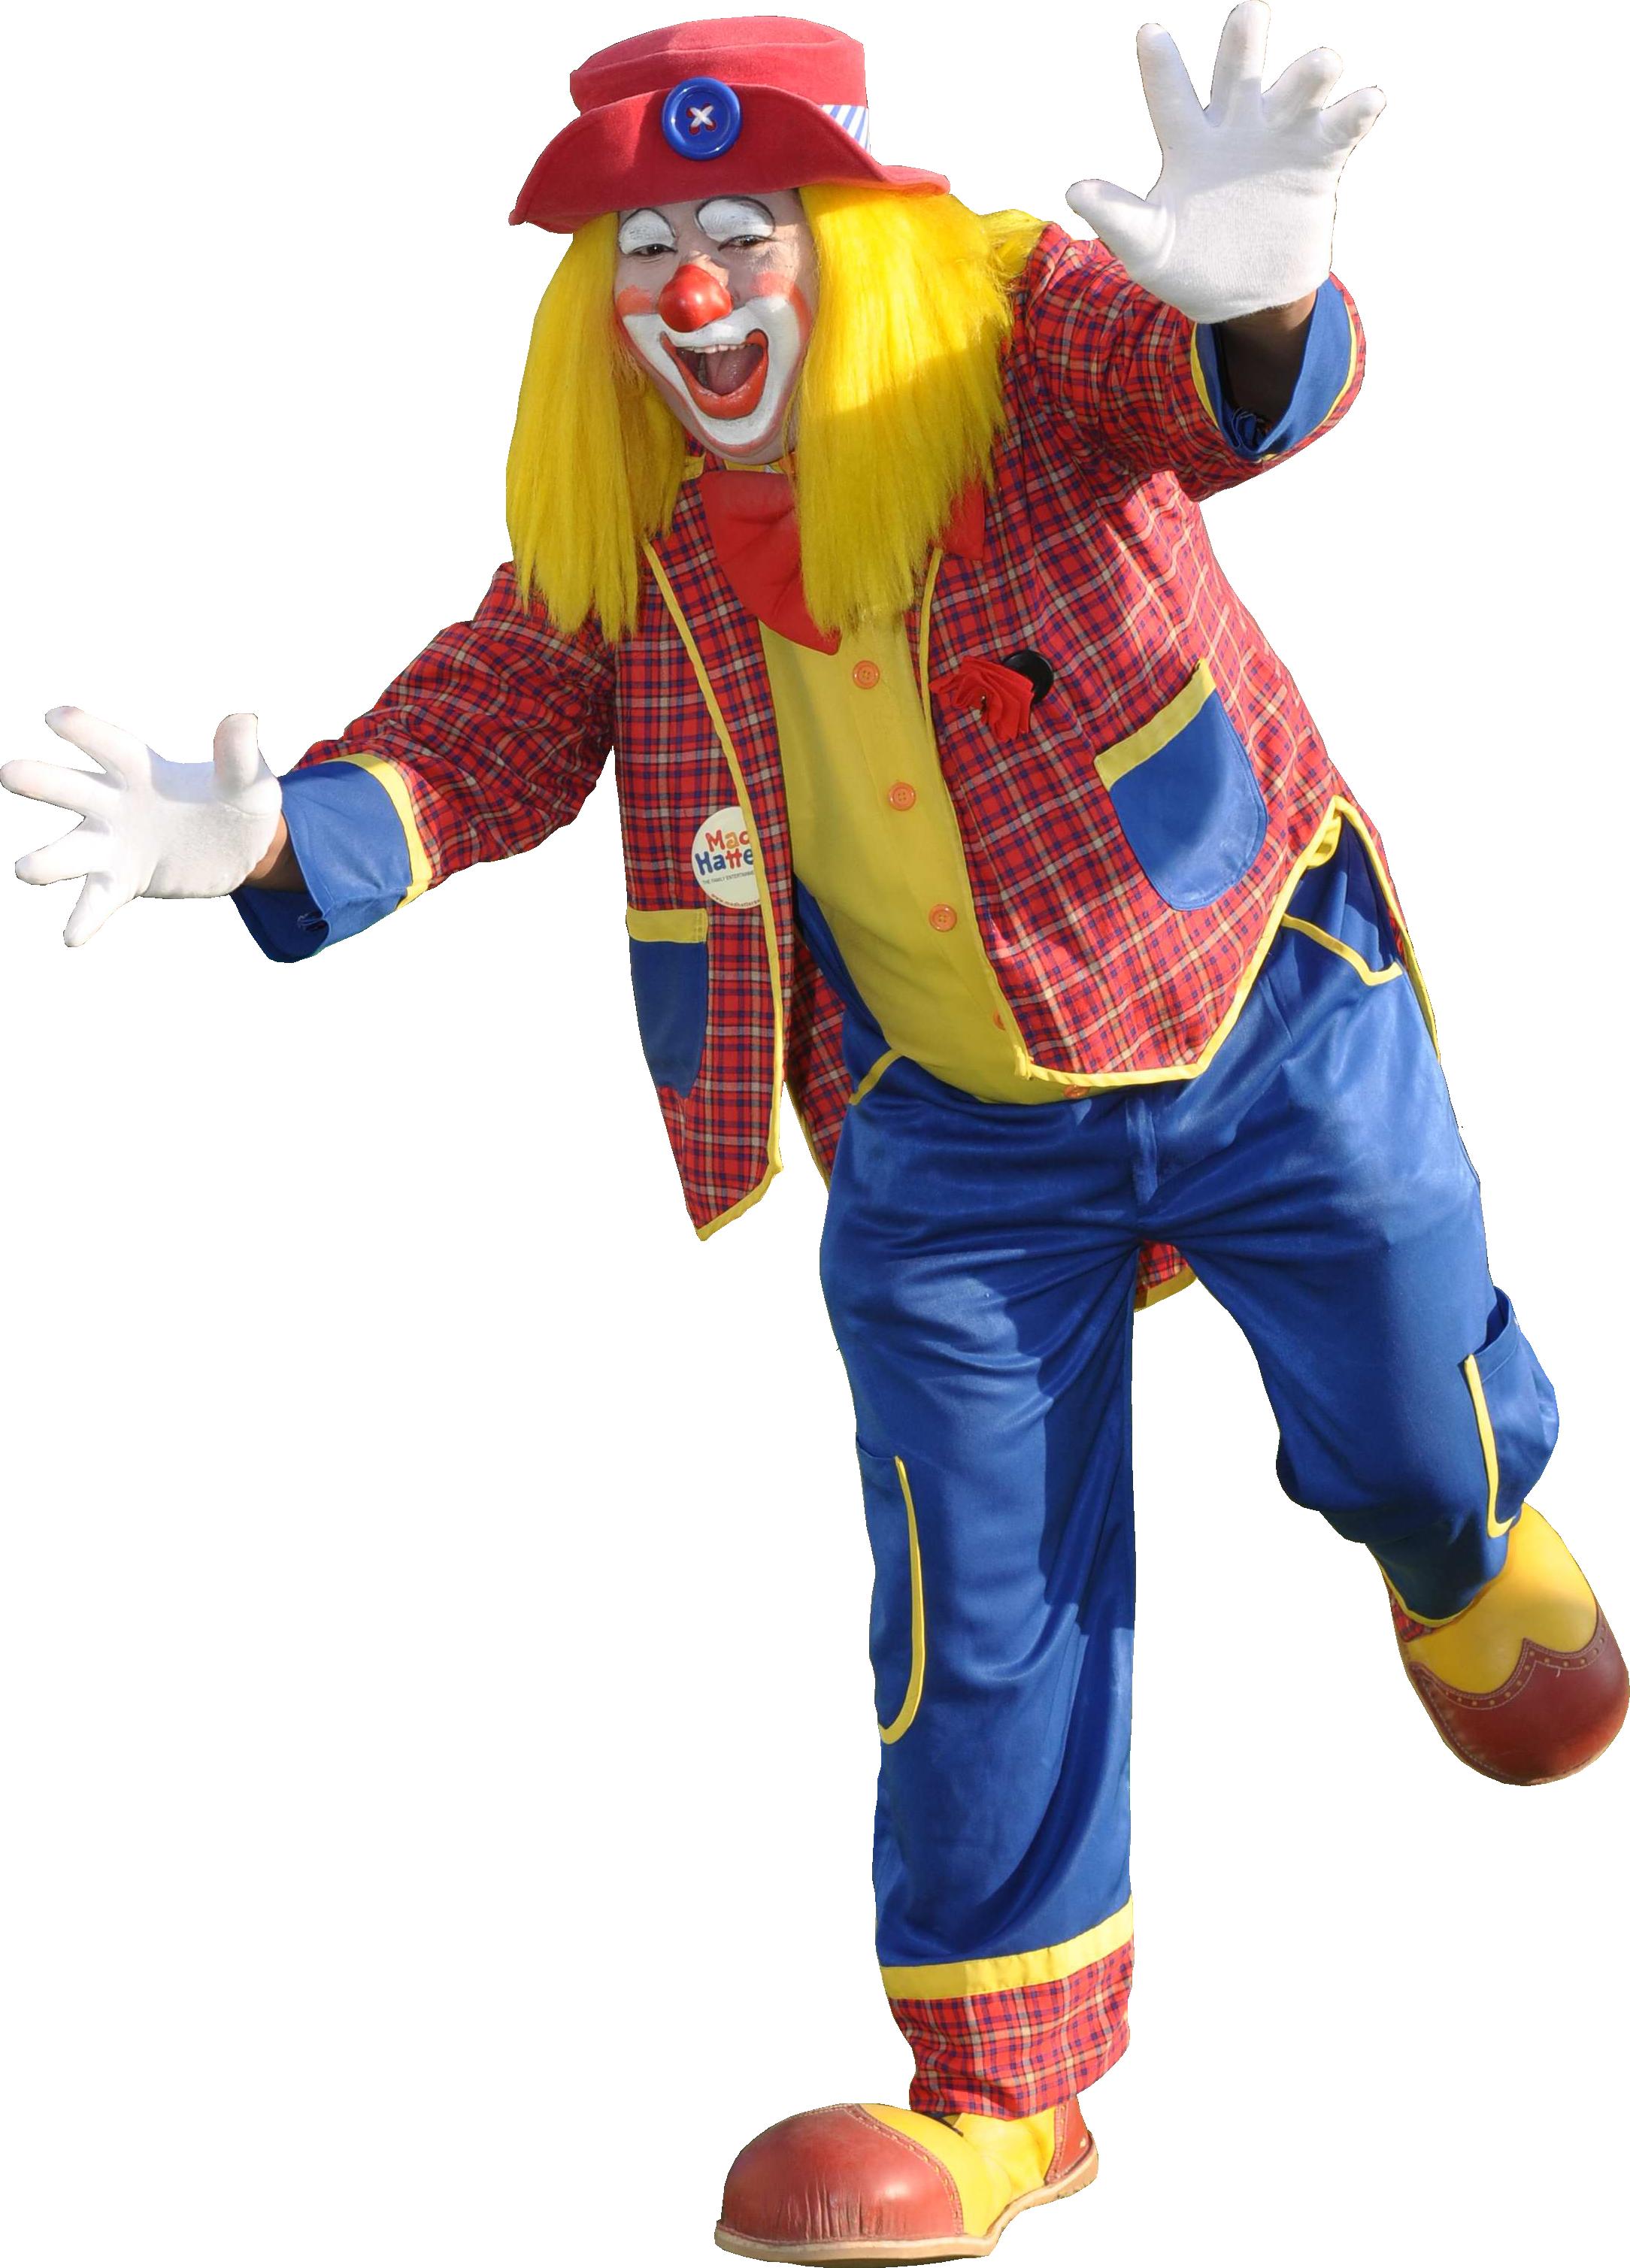 Circus clipart acrobats. Martin flubber dsouza png